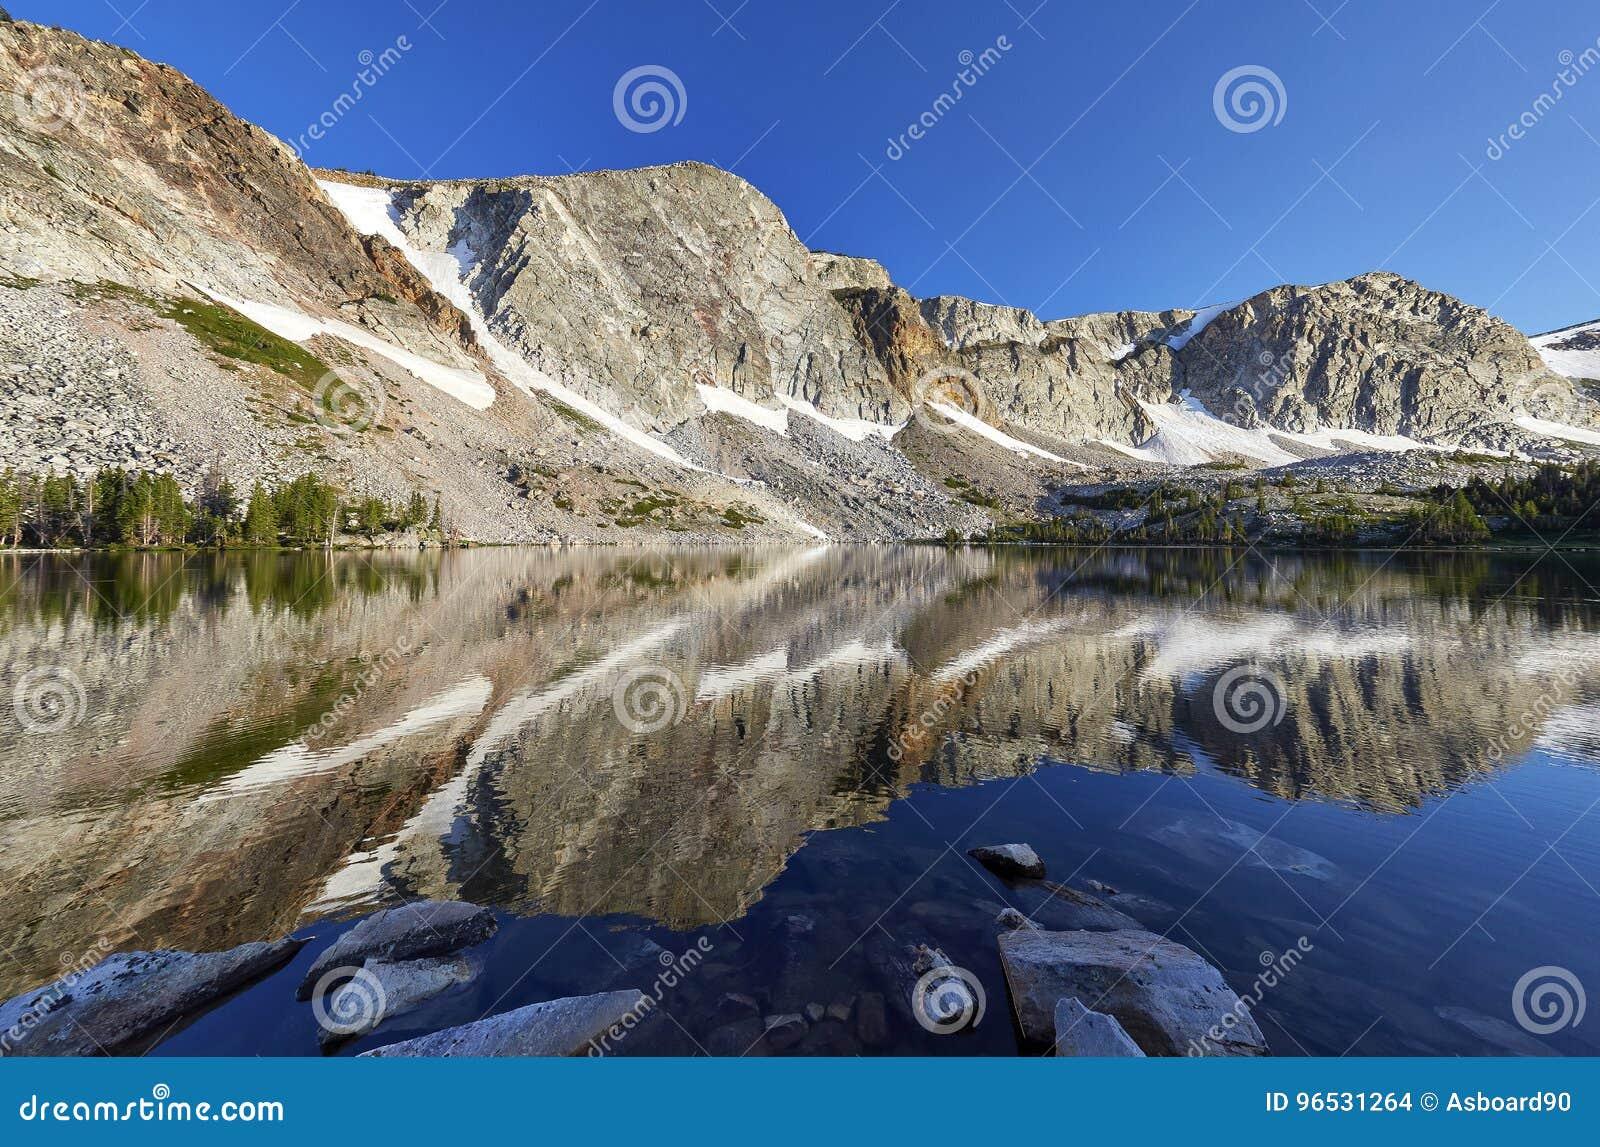 Marie Lake, Snowy Range, Wyoming